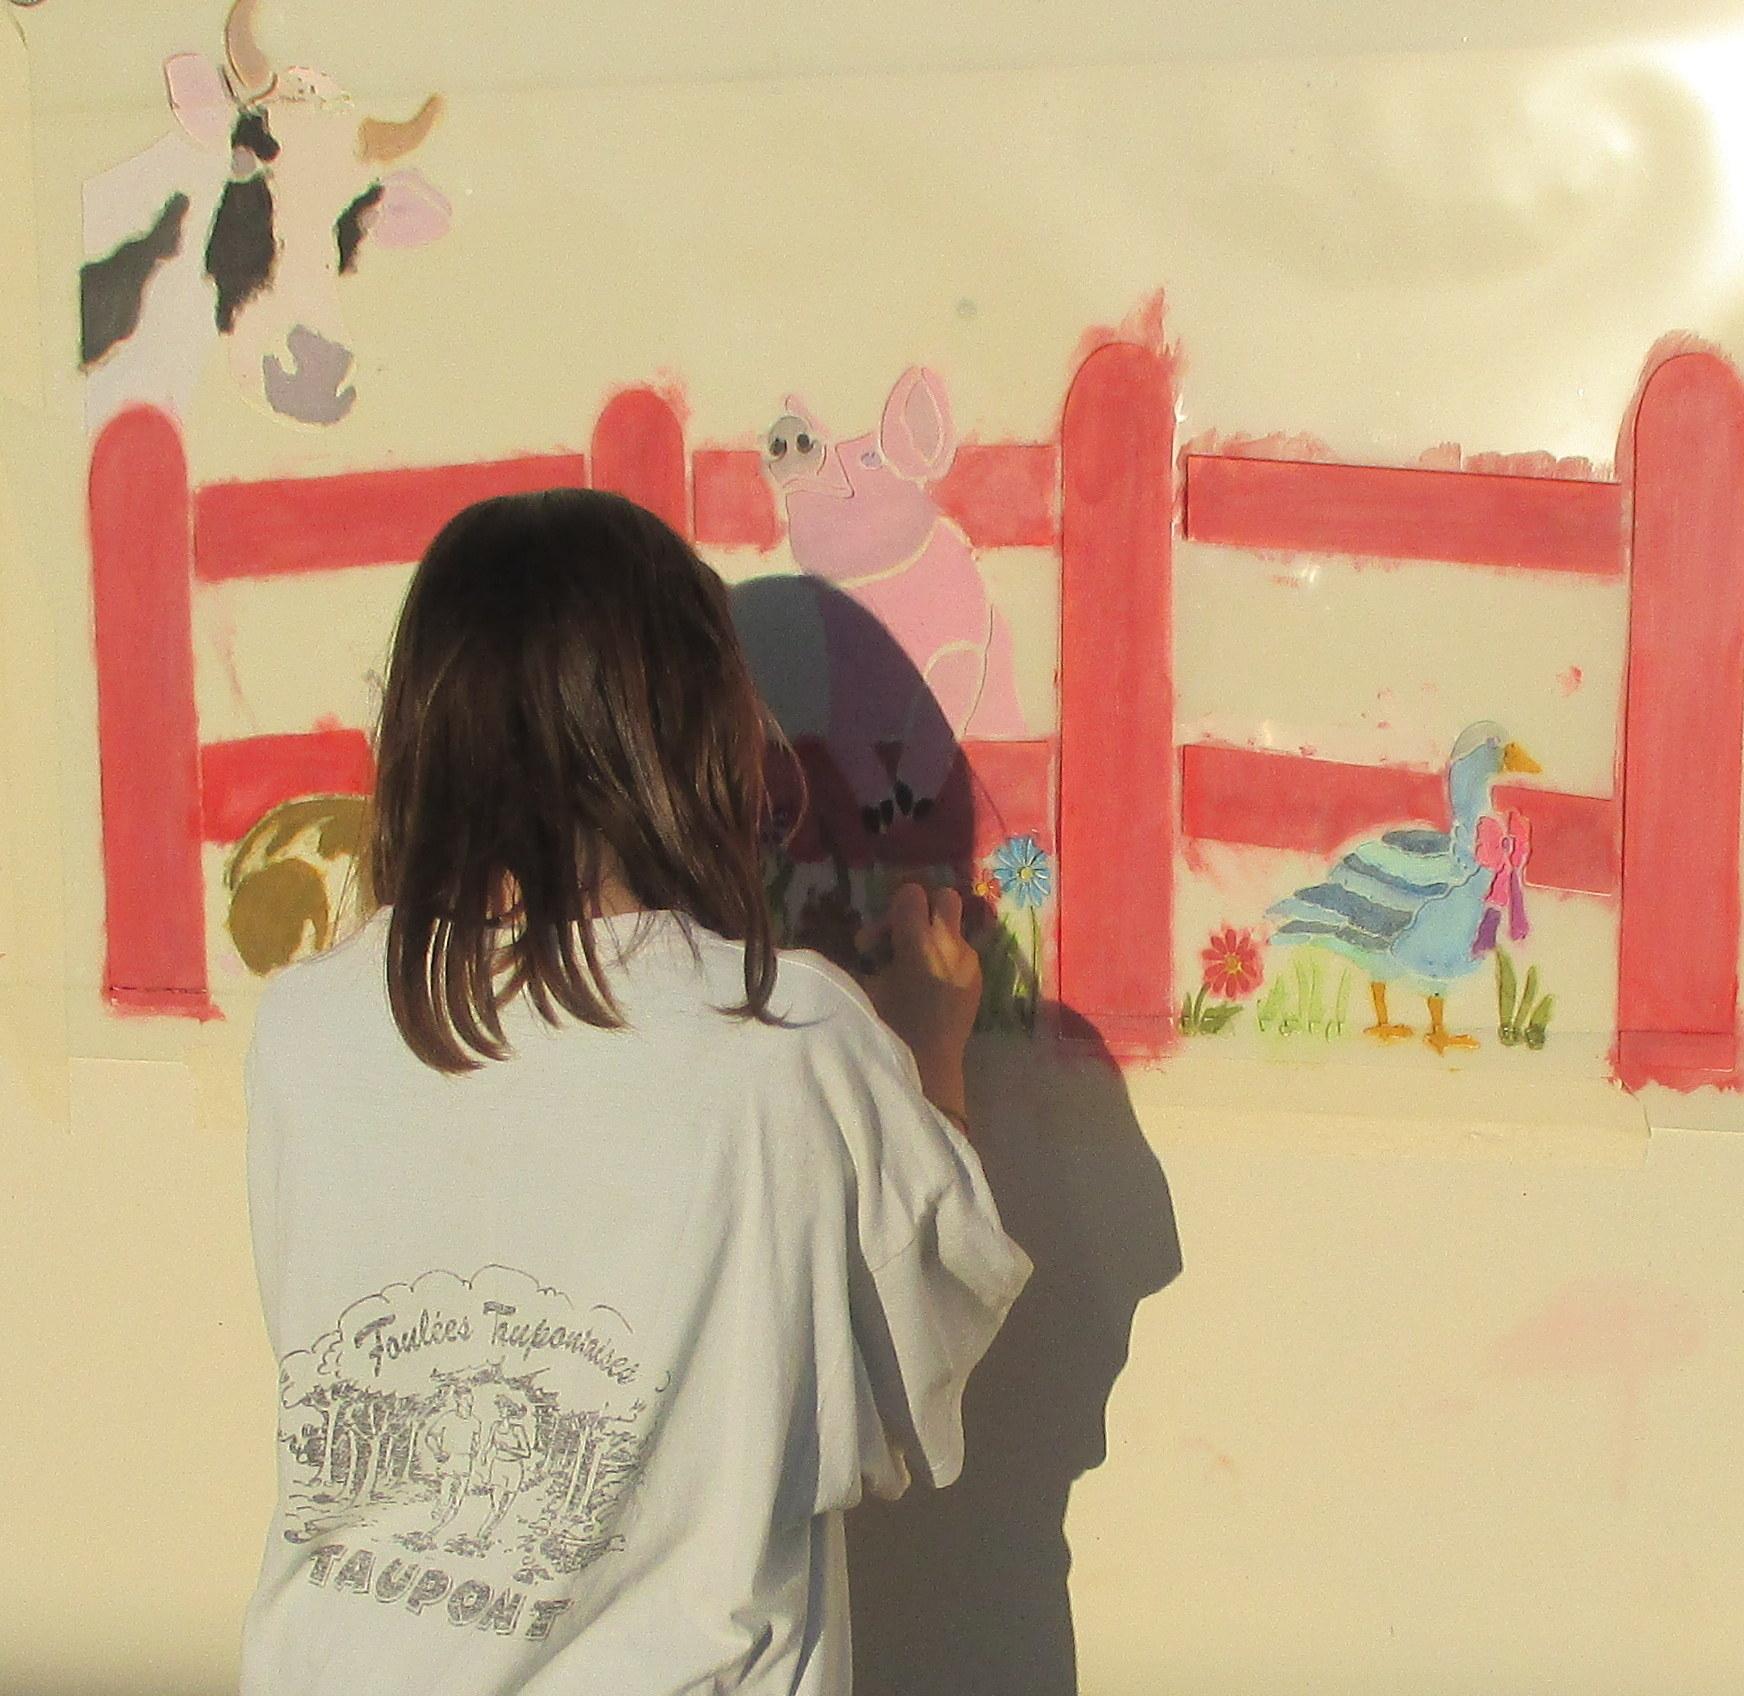 Elisa, artiste à l'oeuvre